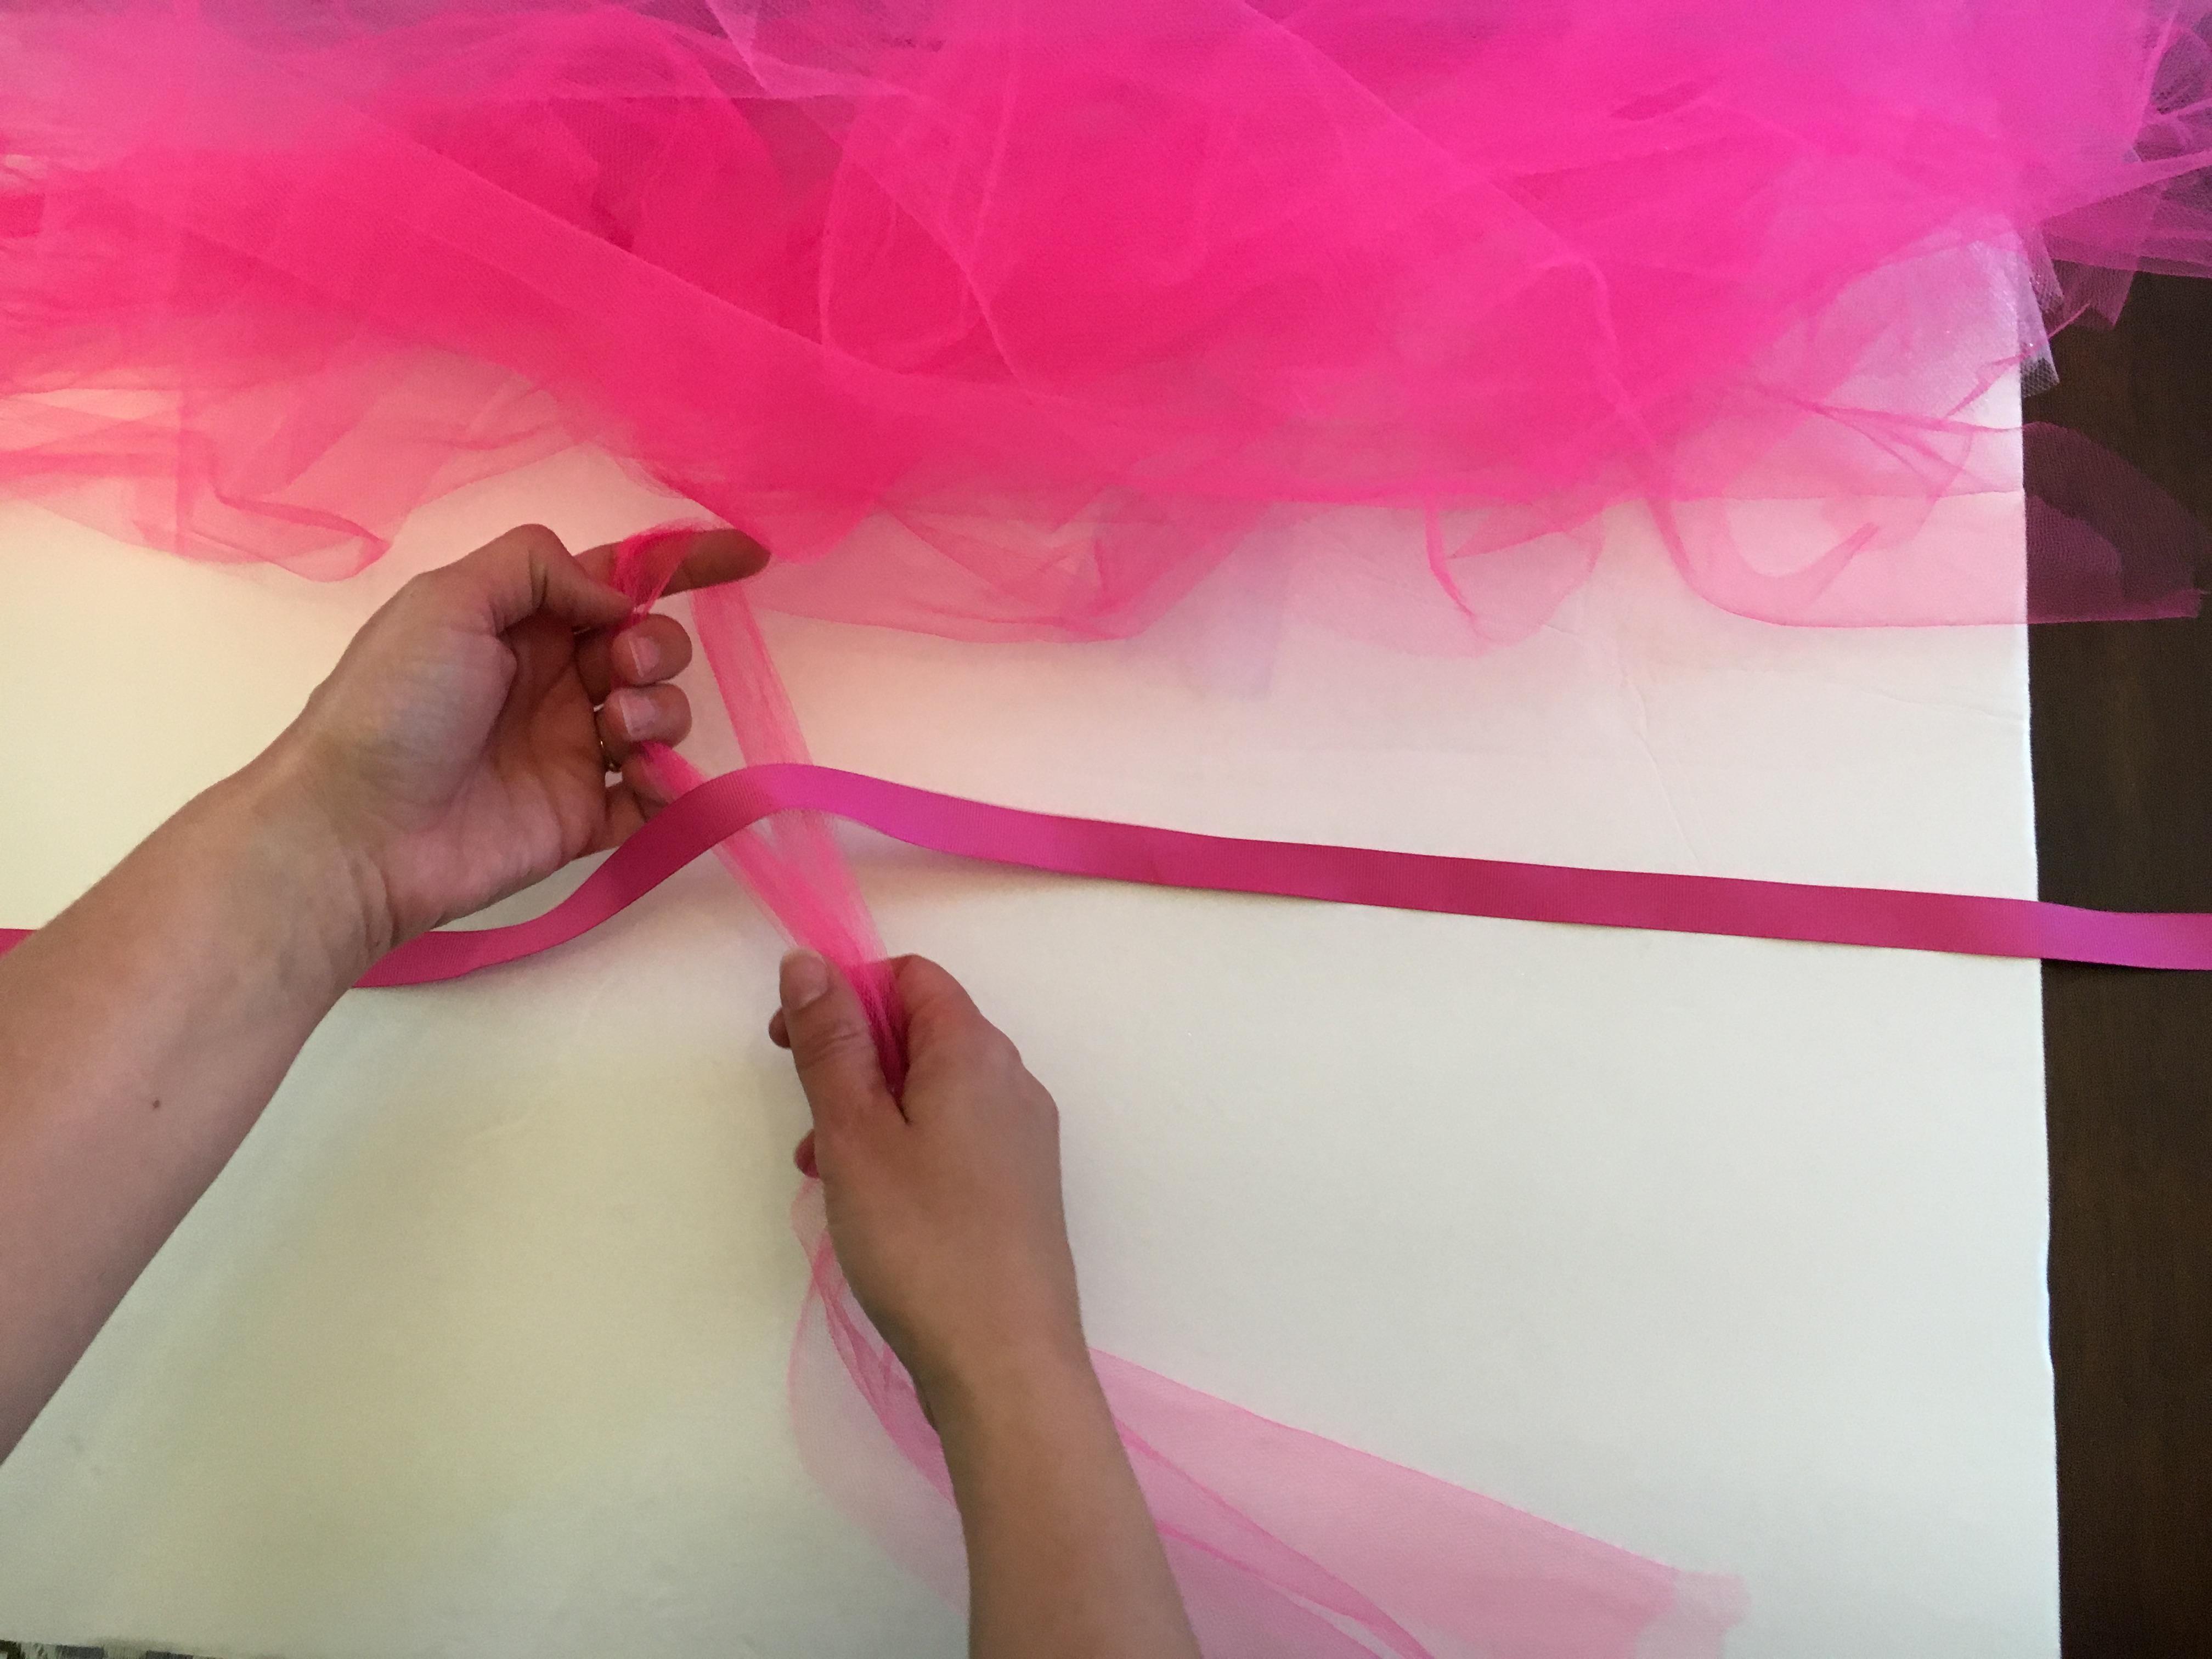 DIY No Sew Tulle Tutu--takes less than 30 minutes start to finish!